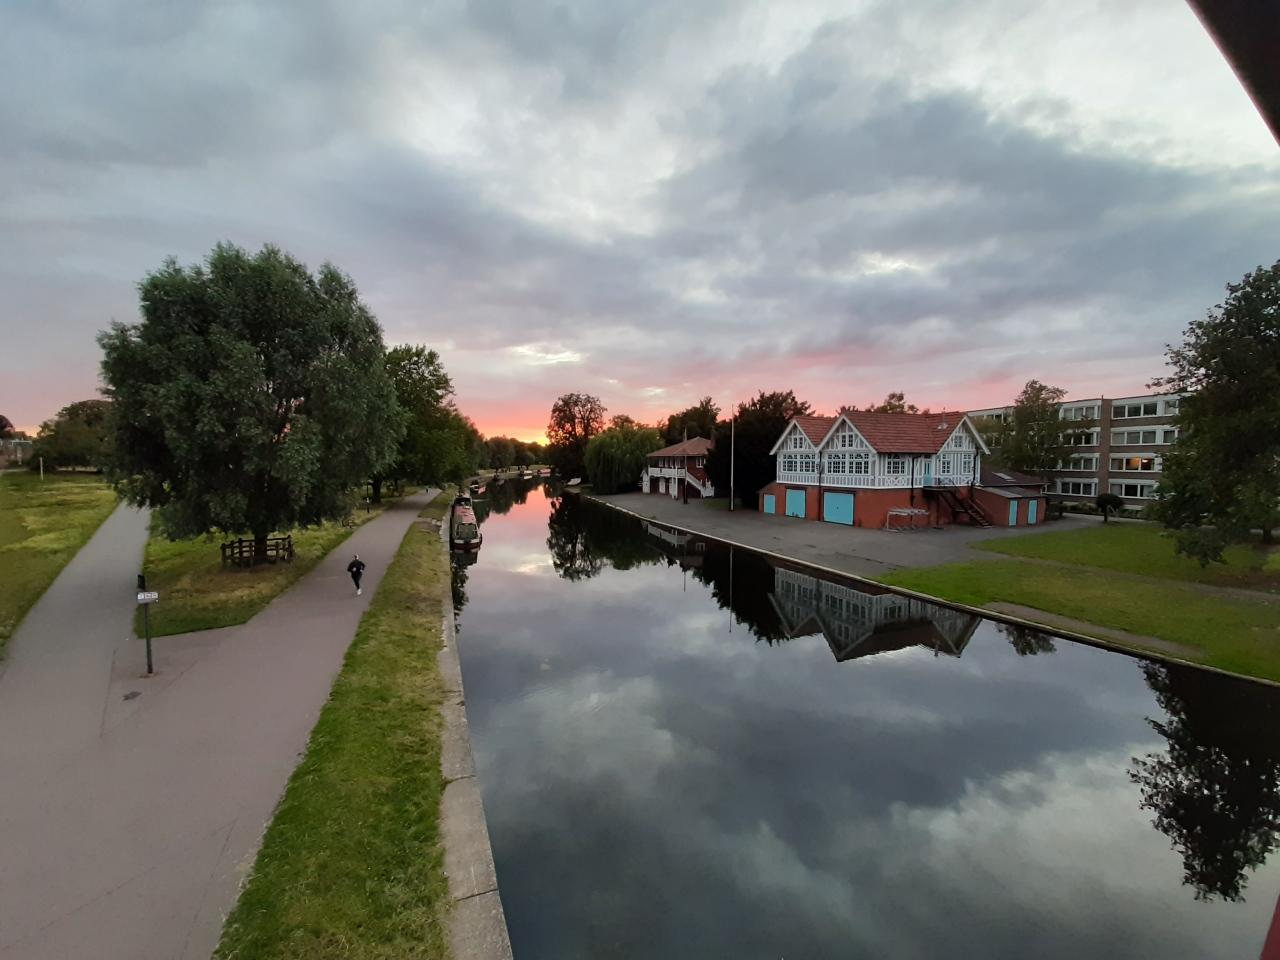 Cambridge and surroundings